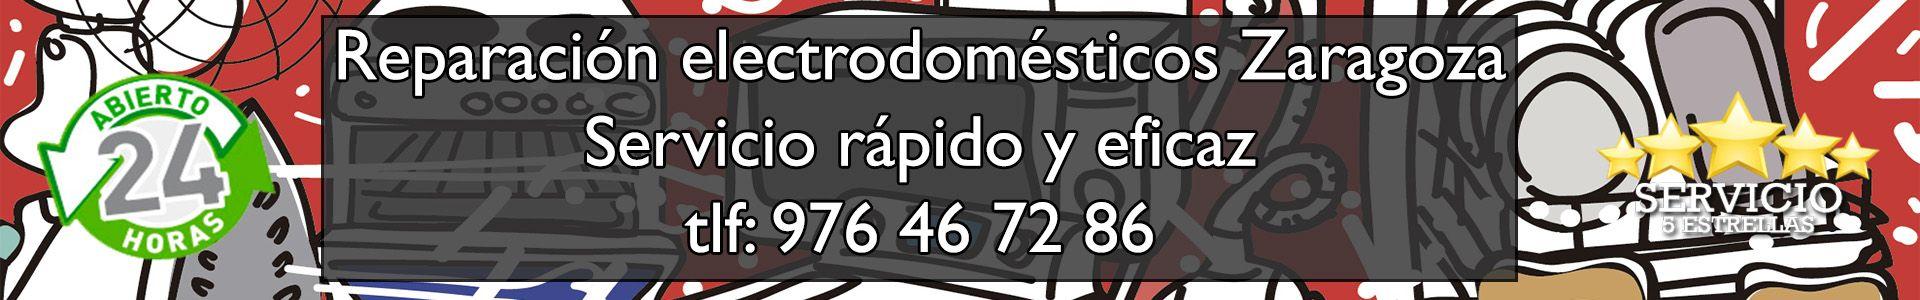 Reparación Electrodomésticos Zaragoza